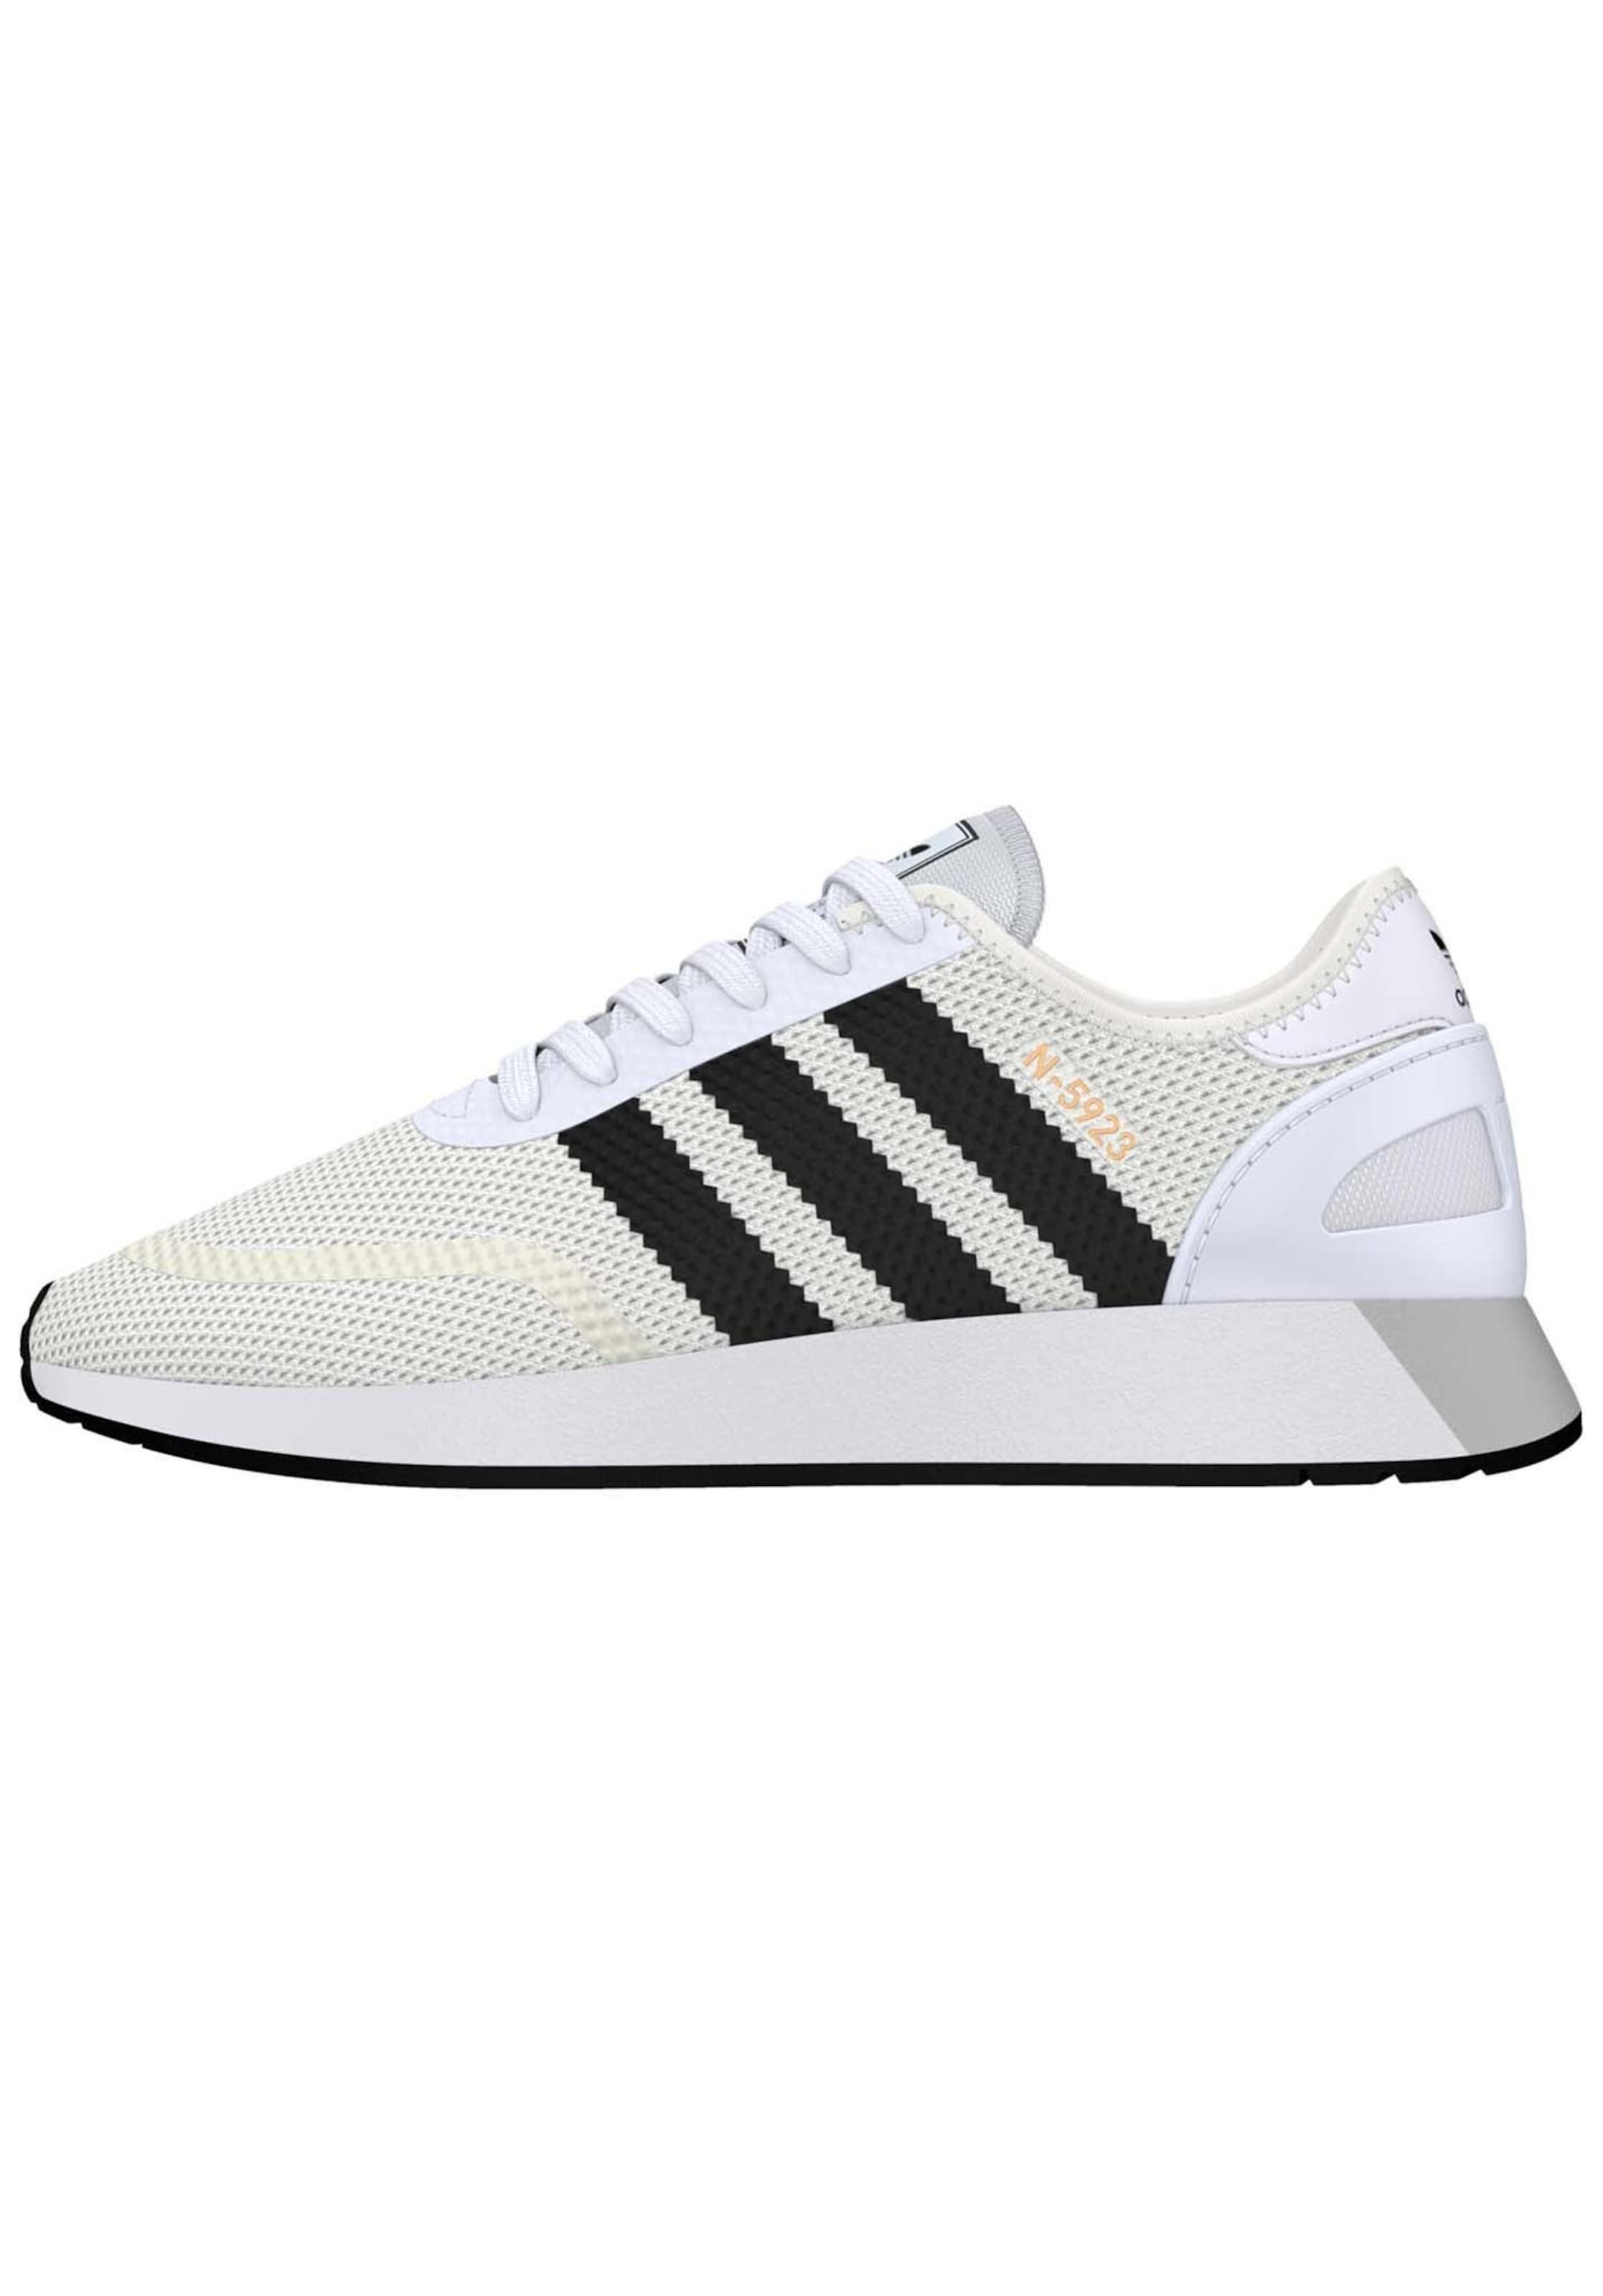 Haltbare Mode billige Schuhe ADIDAS ORIGINALS   'N-5923' Sneaker Schuhe Schuhe Sneaker Gut getragene Schuhe e204c0